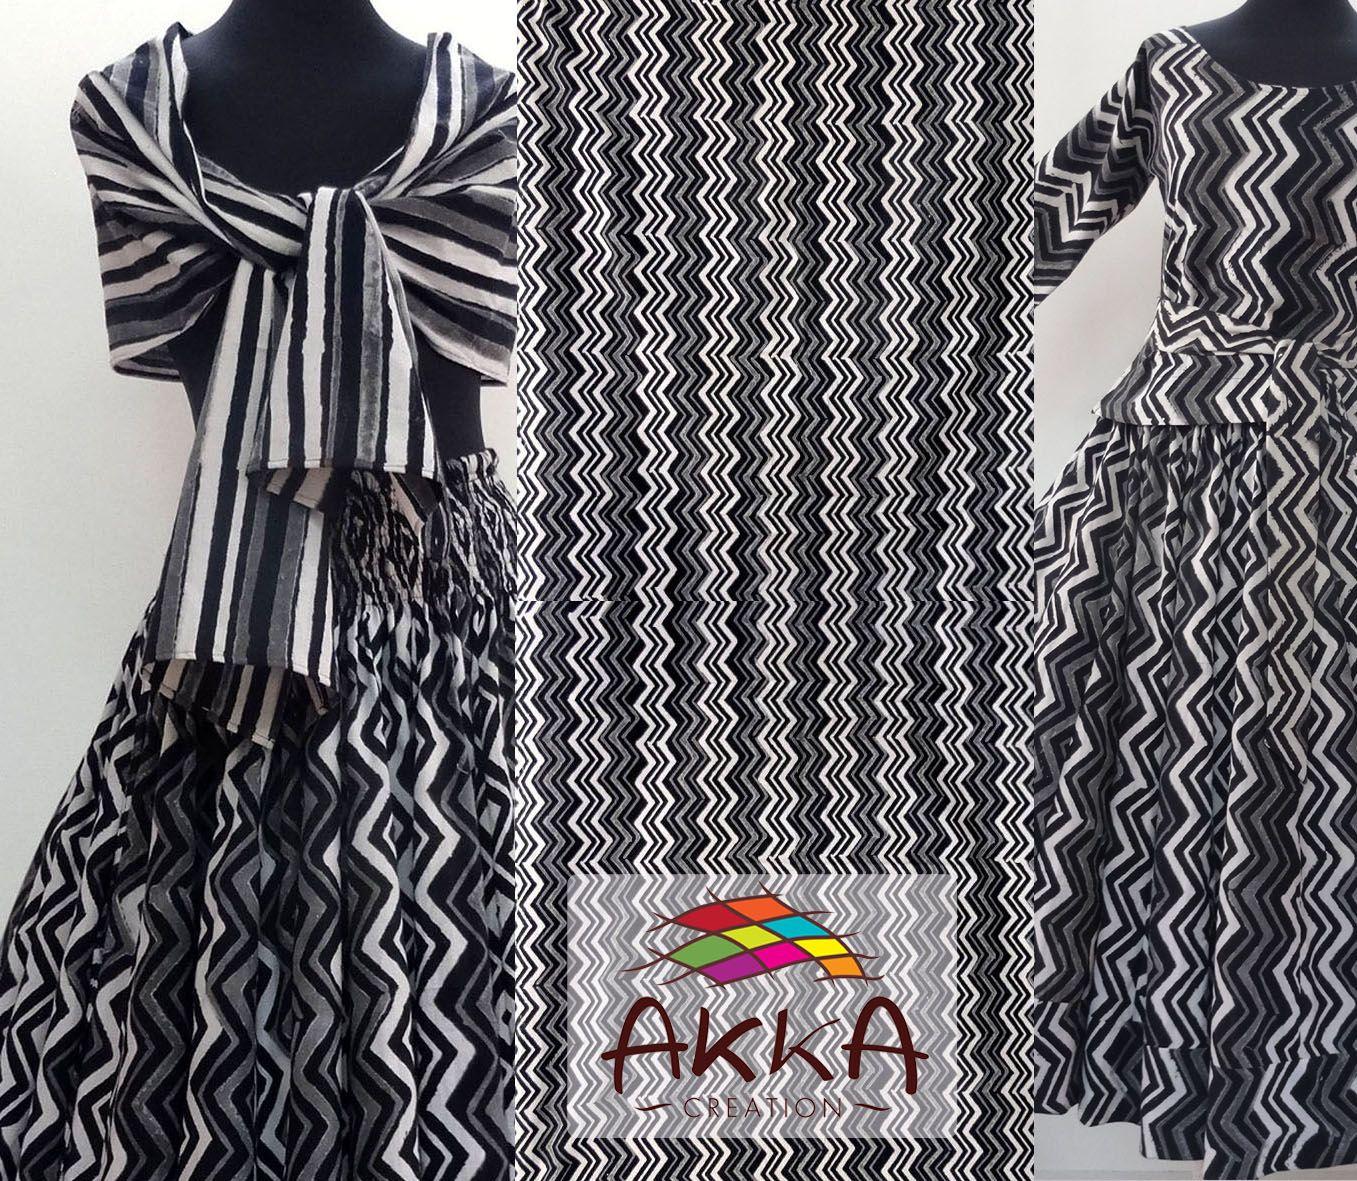 Tenture Africaine Grande Taille Épinglé sur habillage